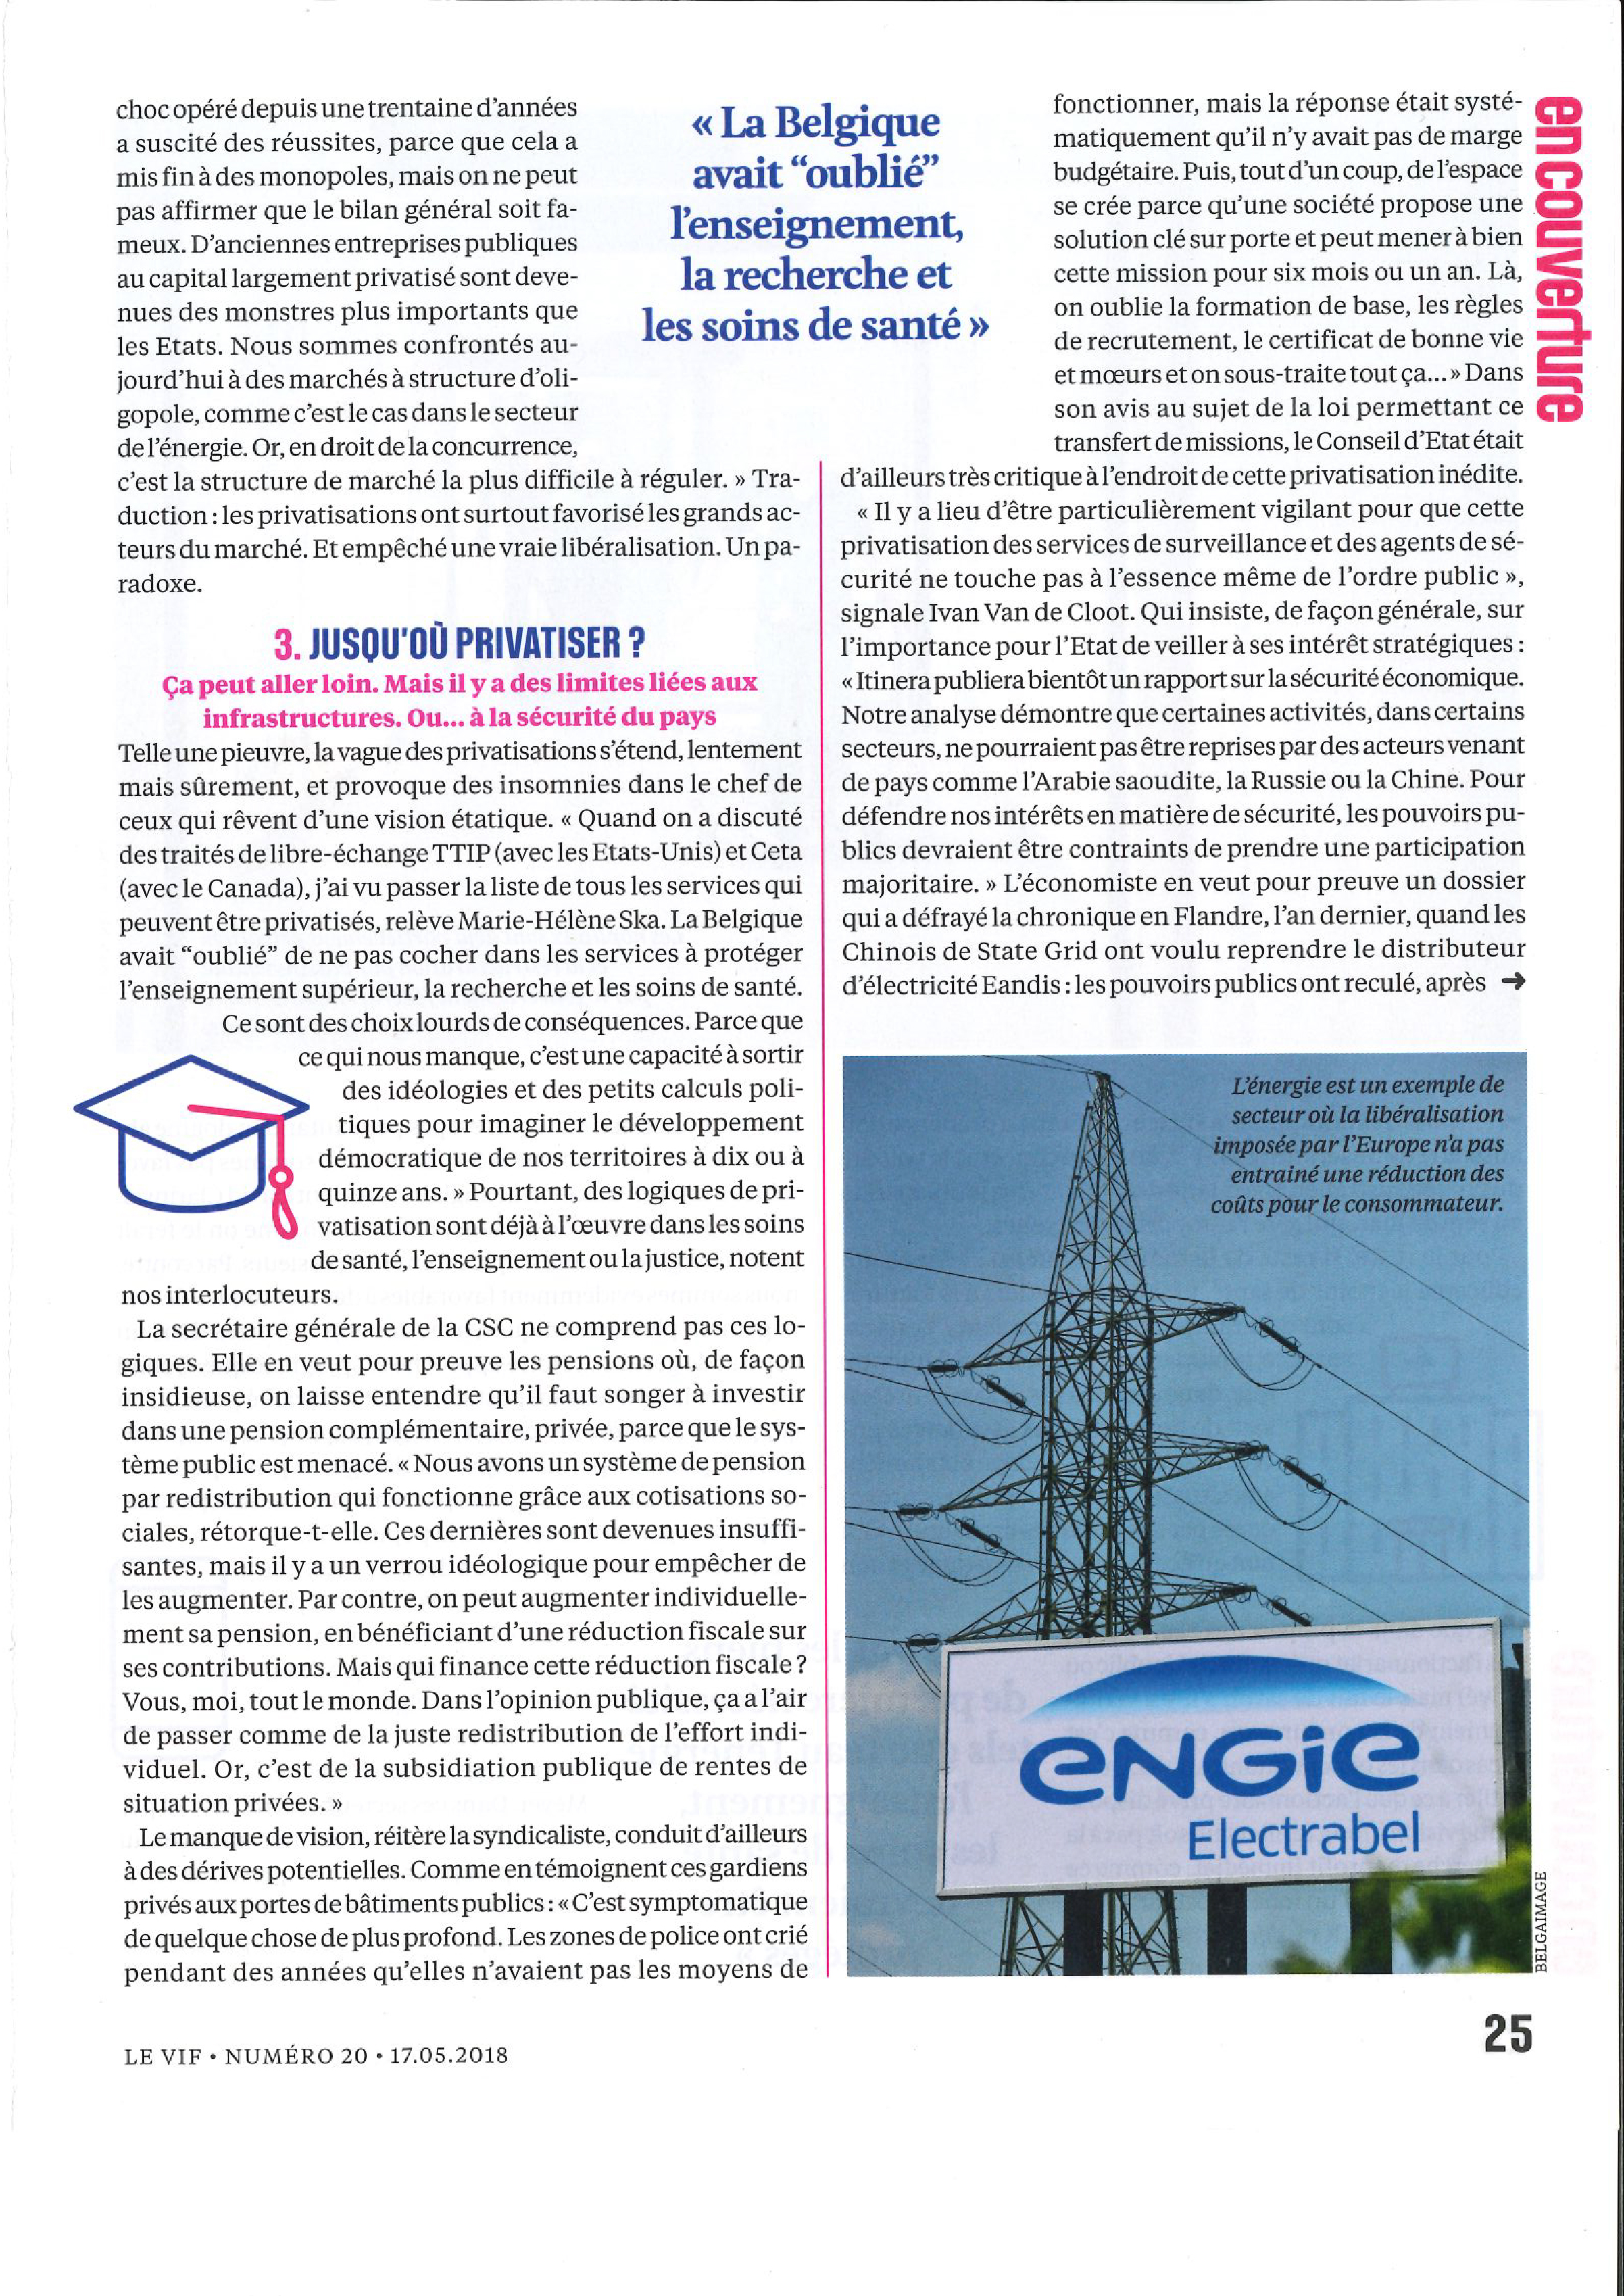 figaro-la-belgique-privatisée-8